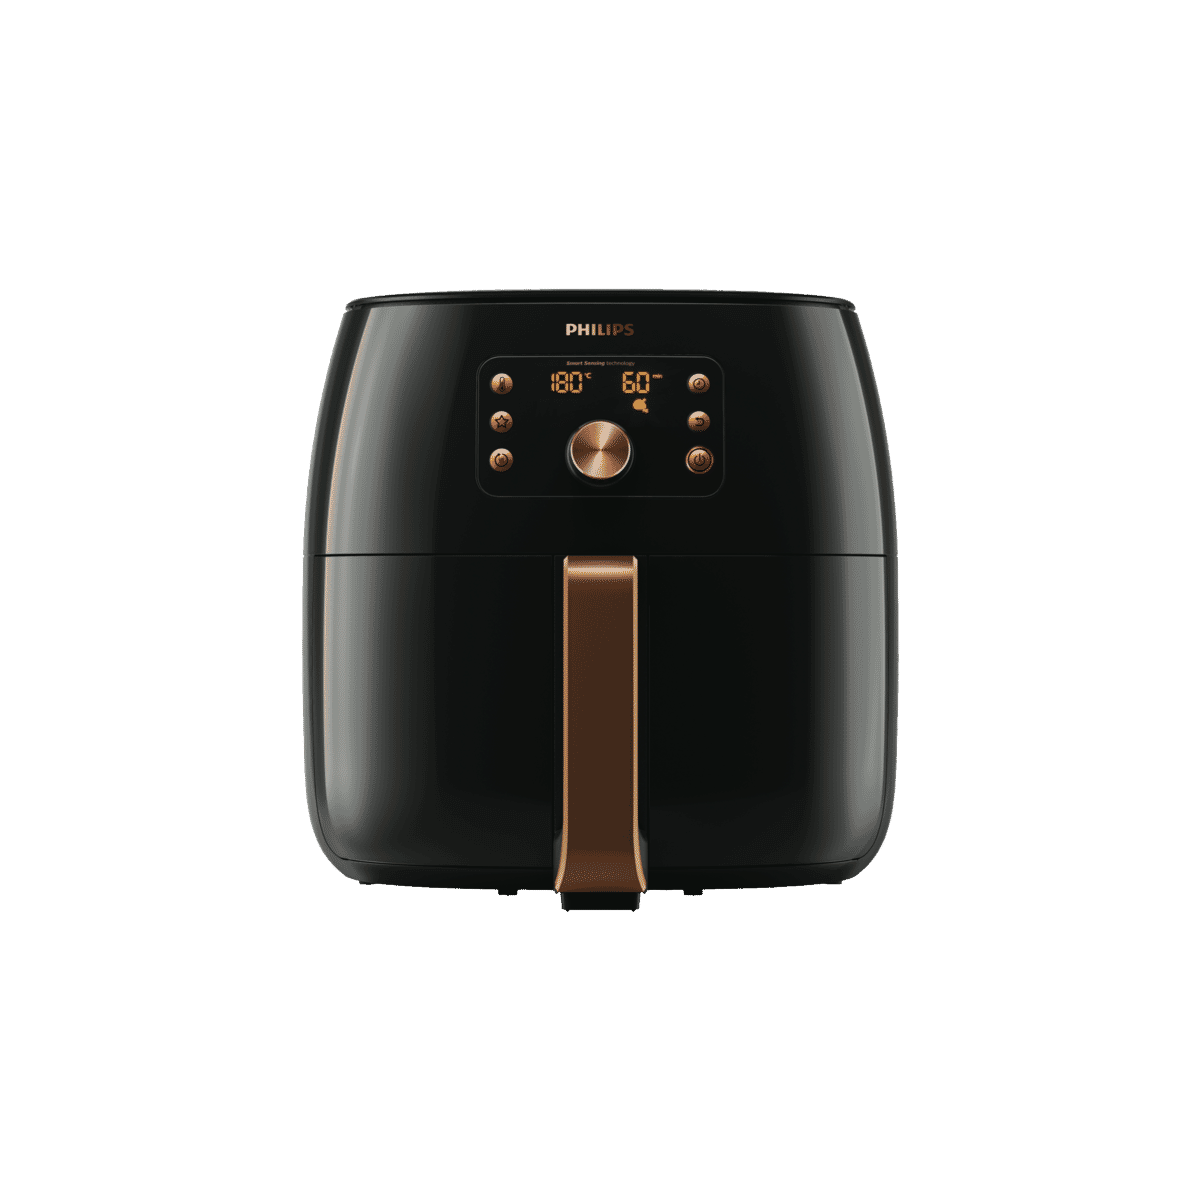 Philips Hd9861 99 Airfryer Xxl Digital Smart Black At The Good Guys